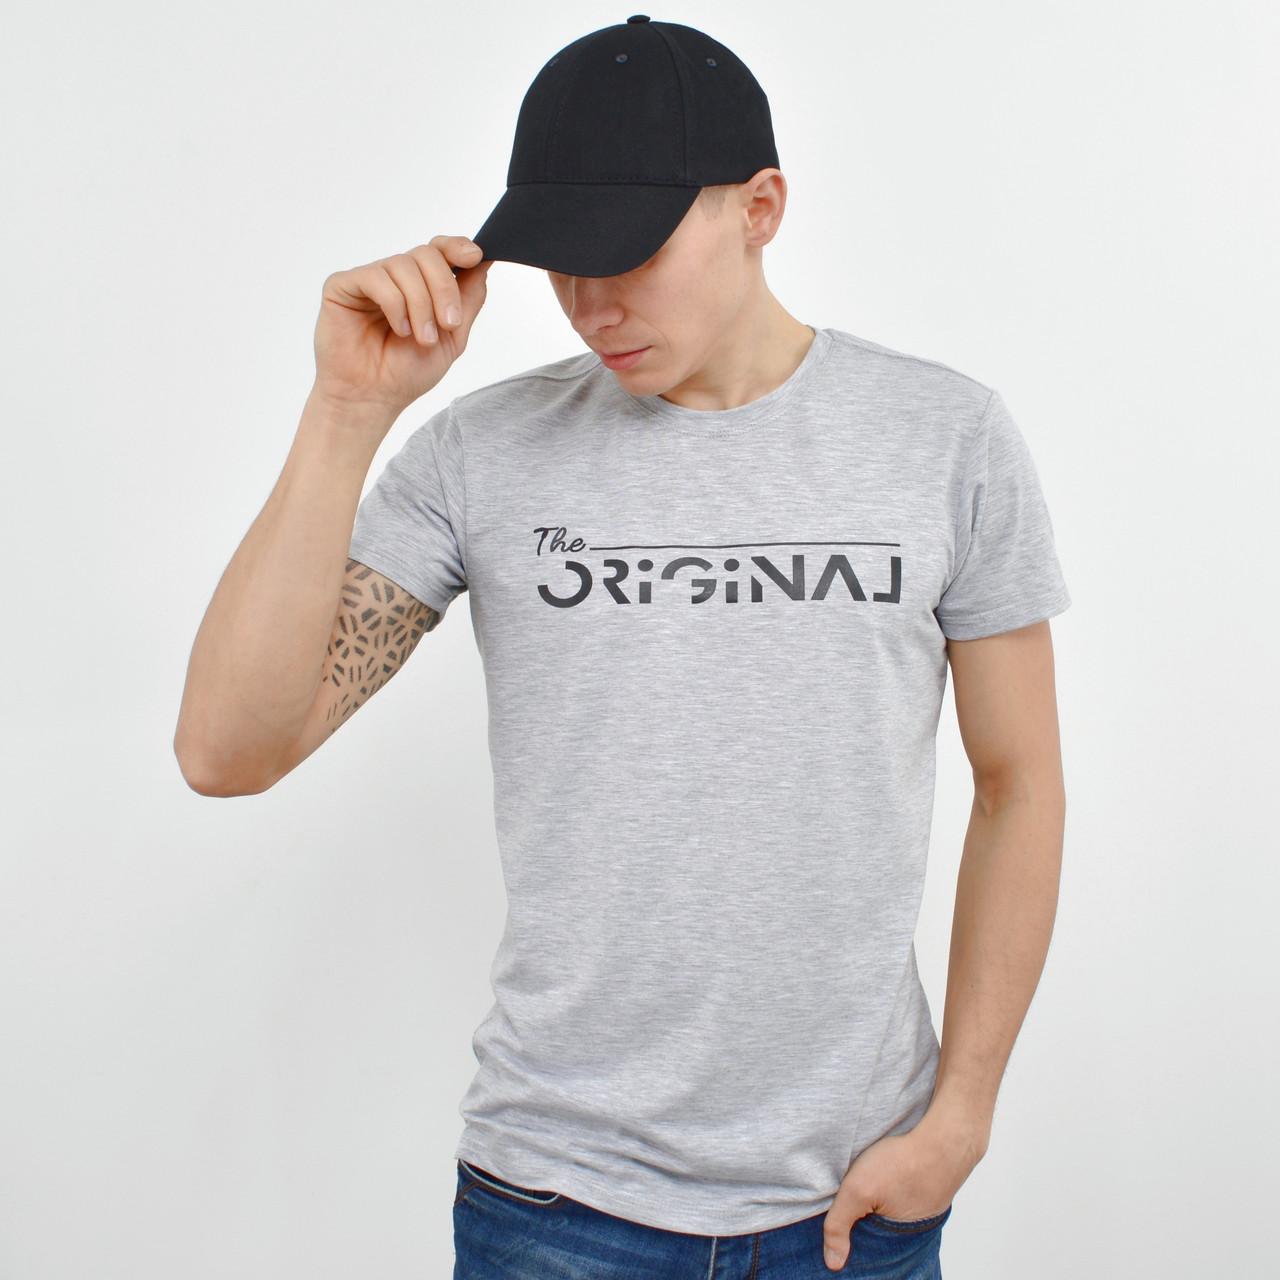 Мужская футболка ORIGINAL  светло серый меланж